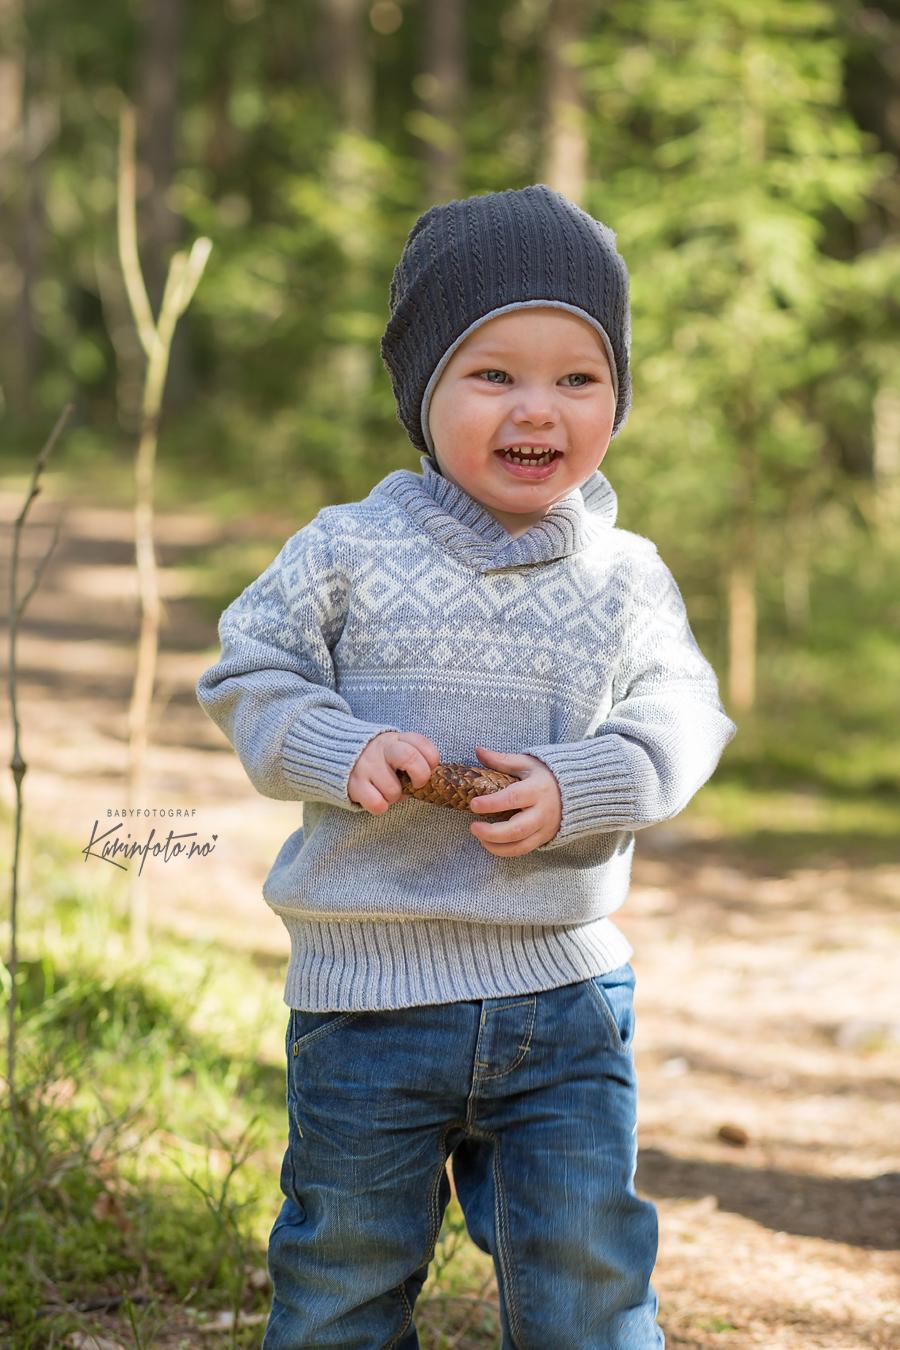 Babyfotograf_karinfoto_barnefotografering,utefotografering,Karin Pedersen